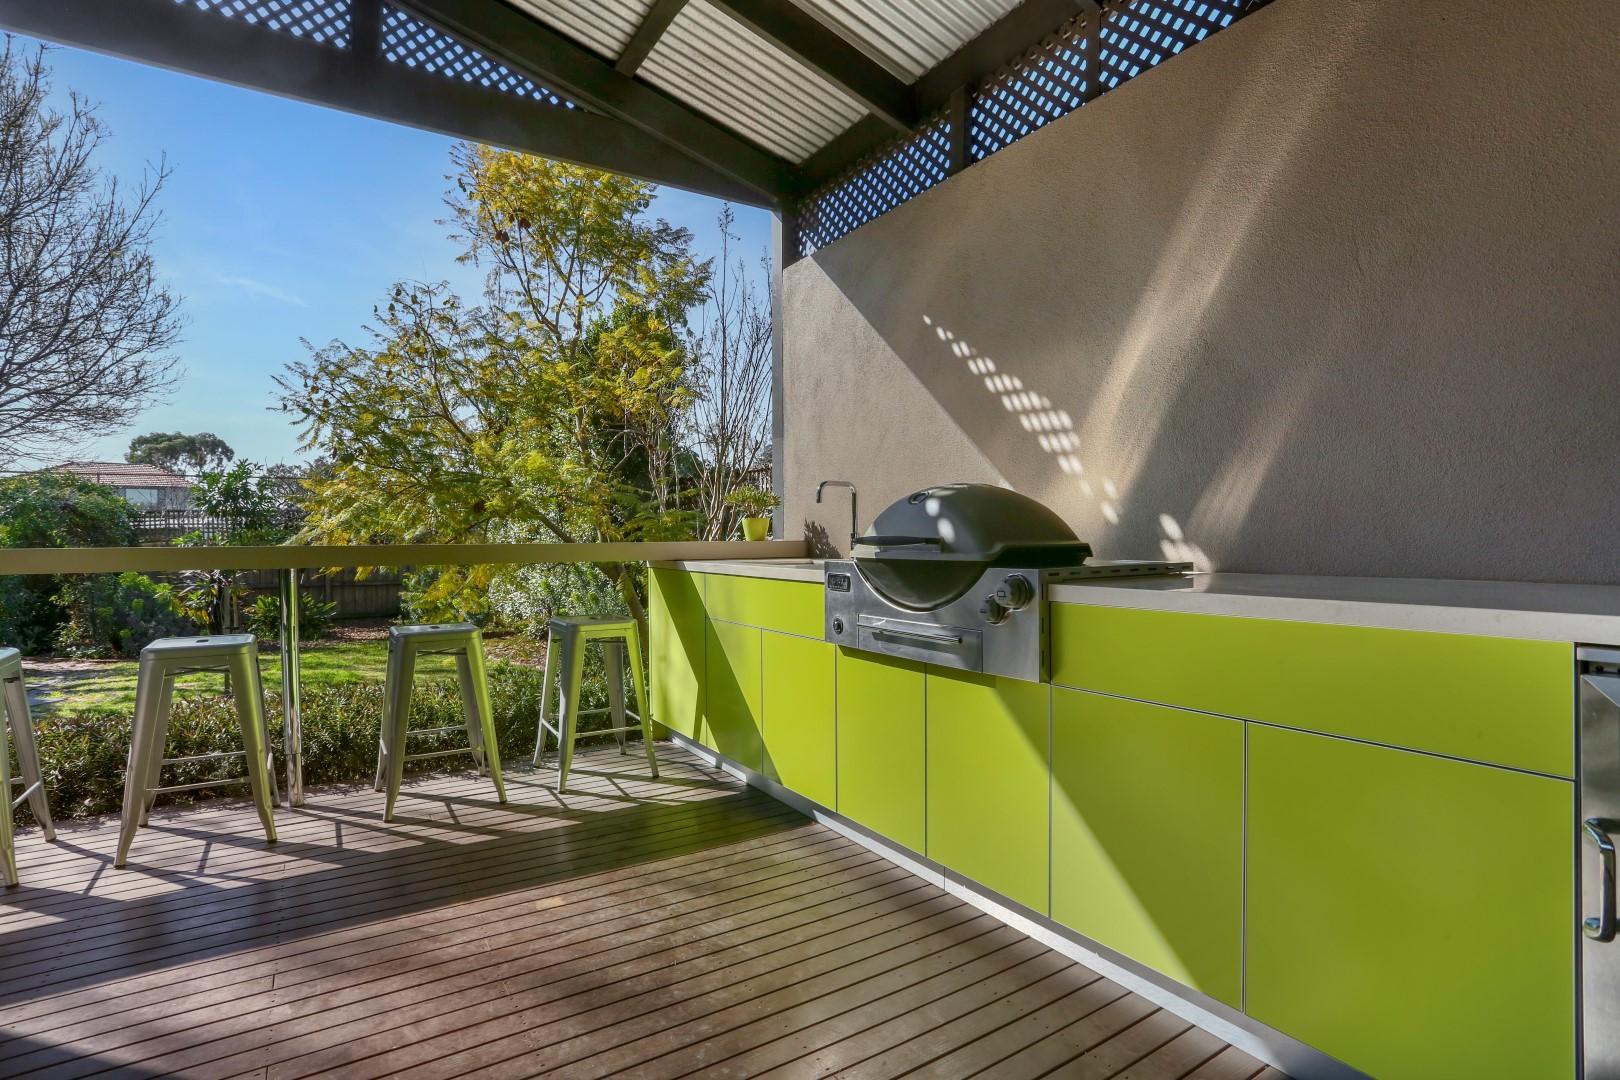 Weber Q3600 Dulux Rainforest Glow Corian Concrete and Clam Shell Alfresco Kitchen